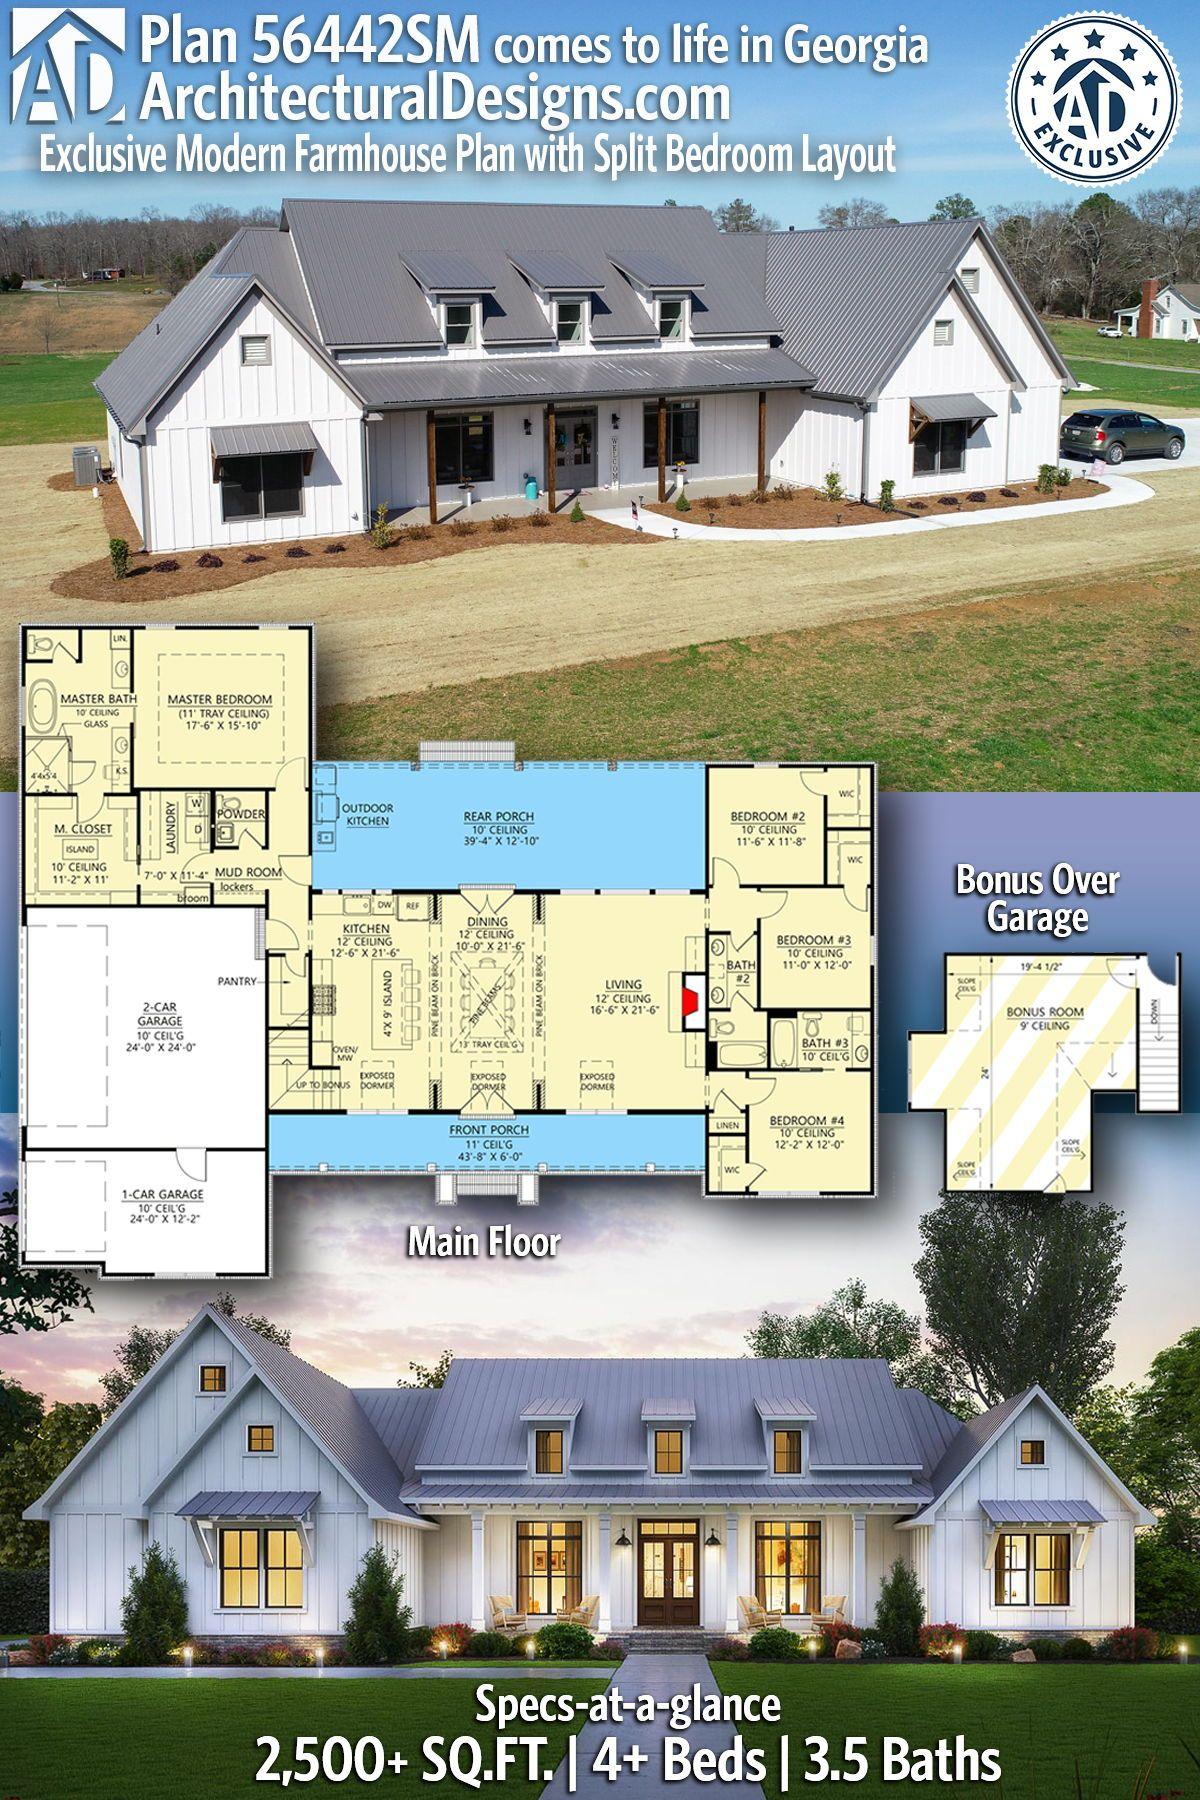 Plan 56442sm Exclusive Modern Farmhouse Plan With Split Bedroom Layout Modern Farmhouse Plans Farmhouse Plans House Plans Farmhouse